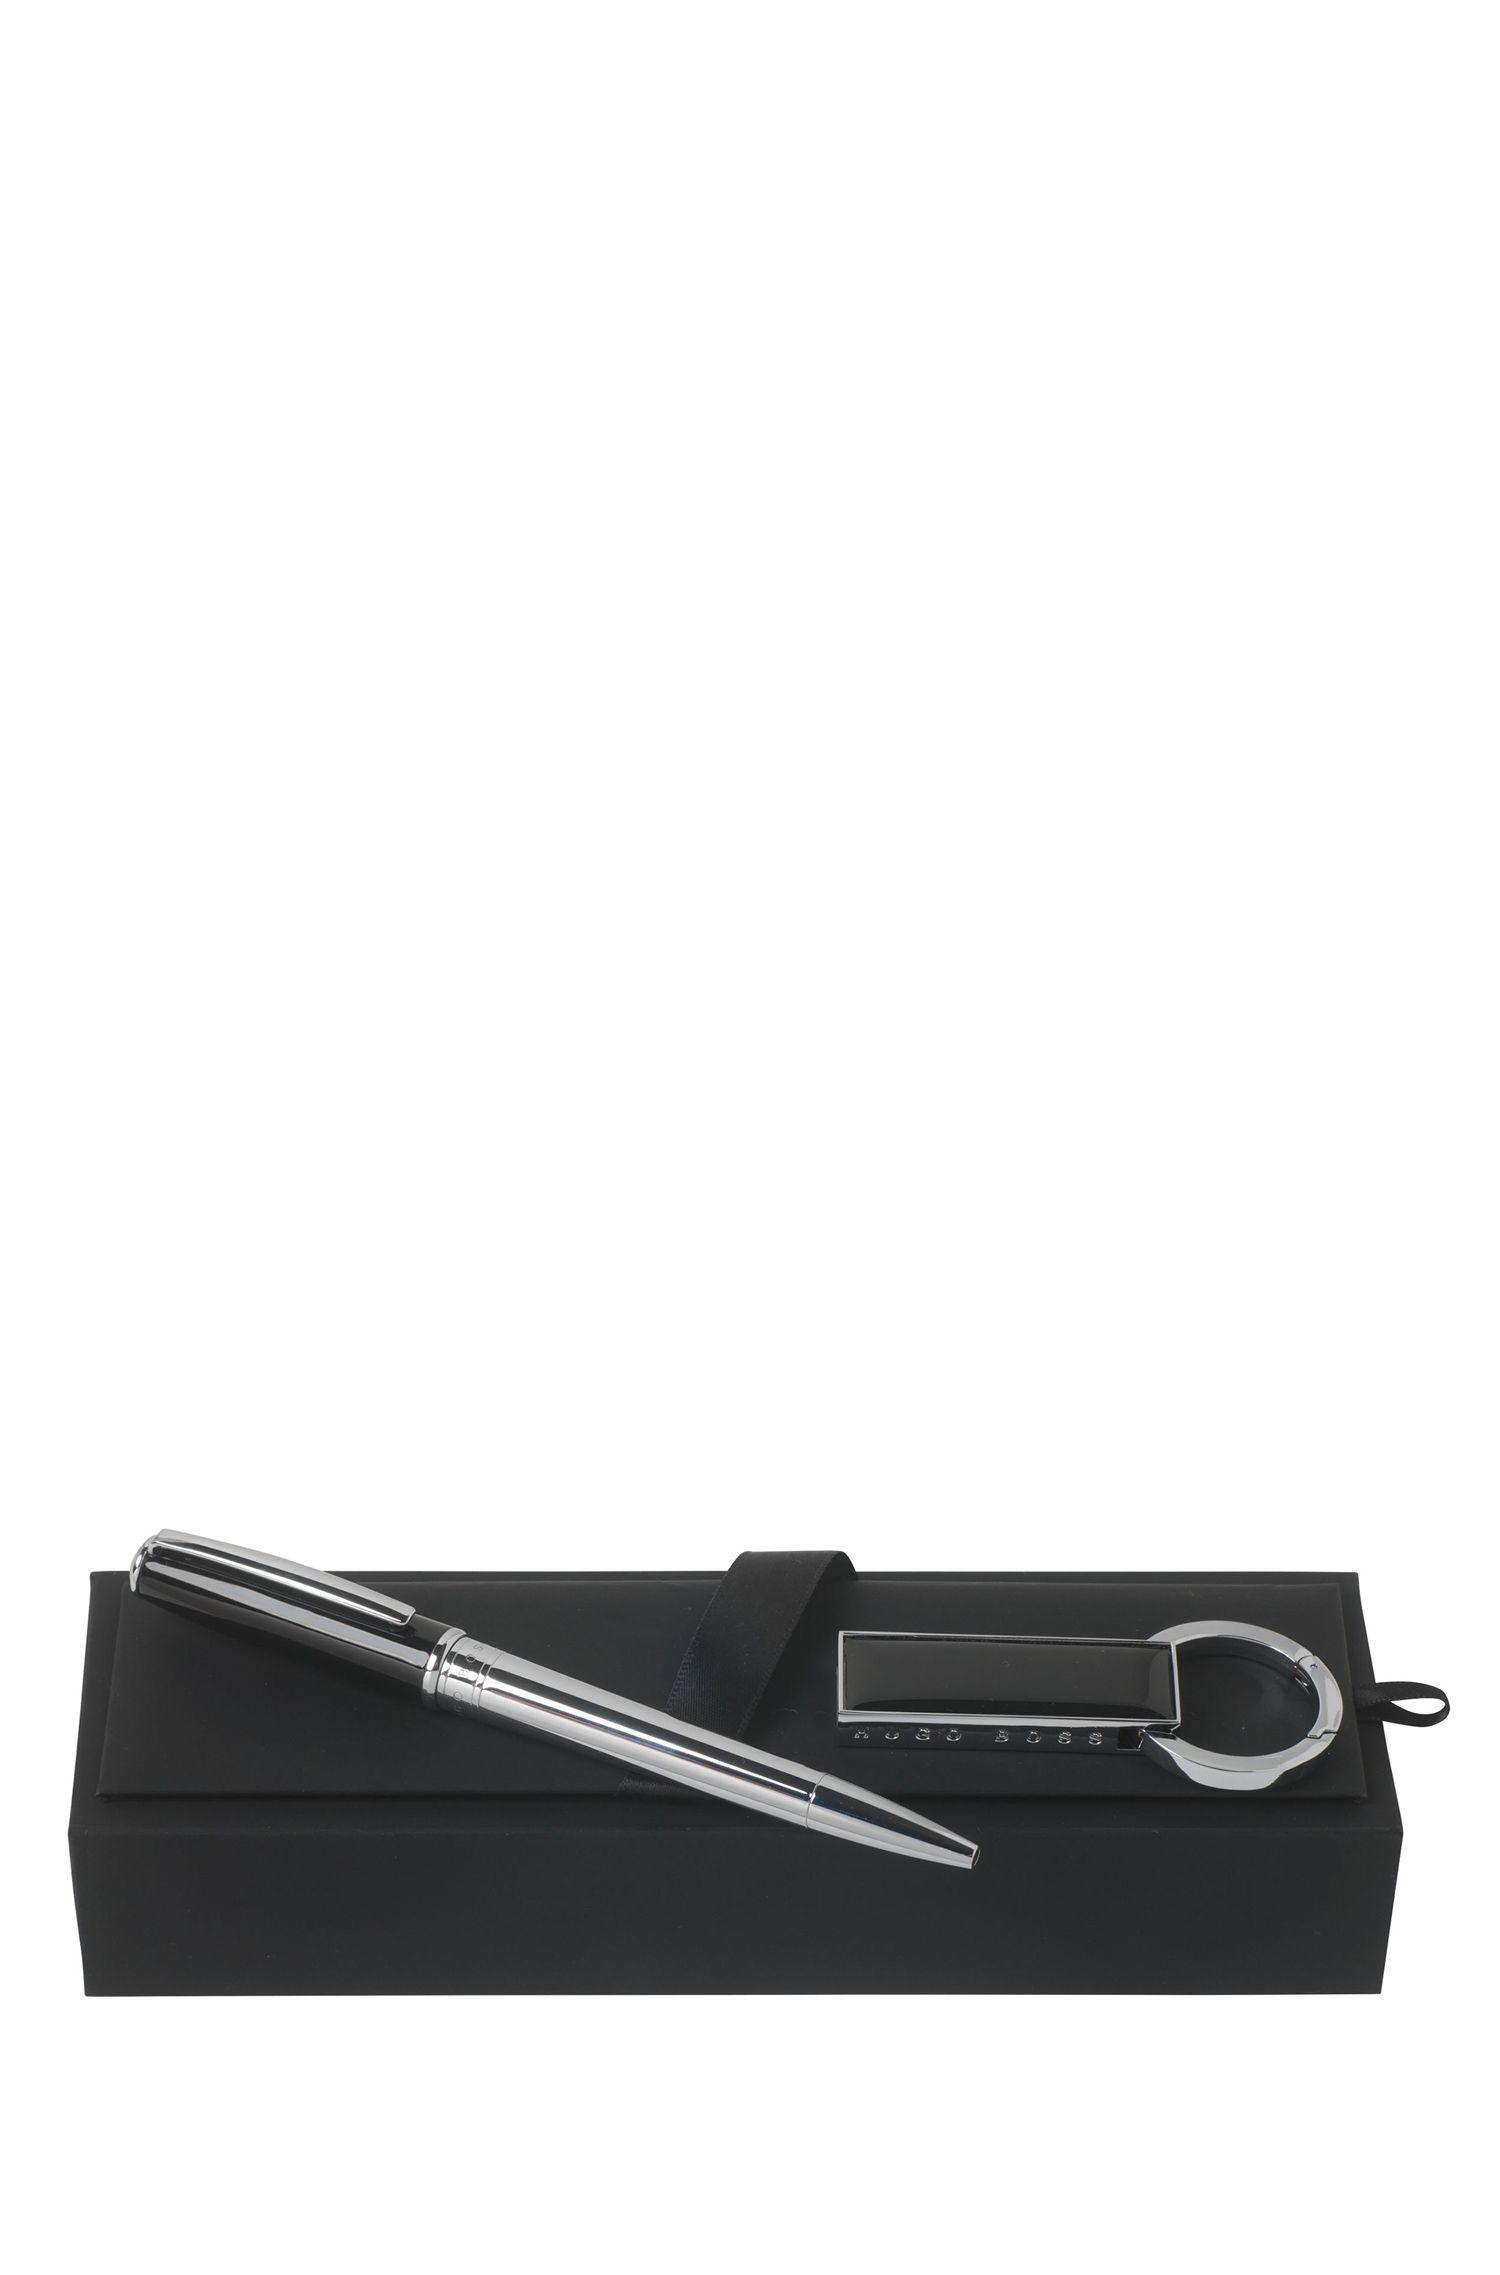 'Essential Set' | Brass Ballpoint Ben, USB Stick Set